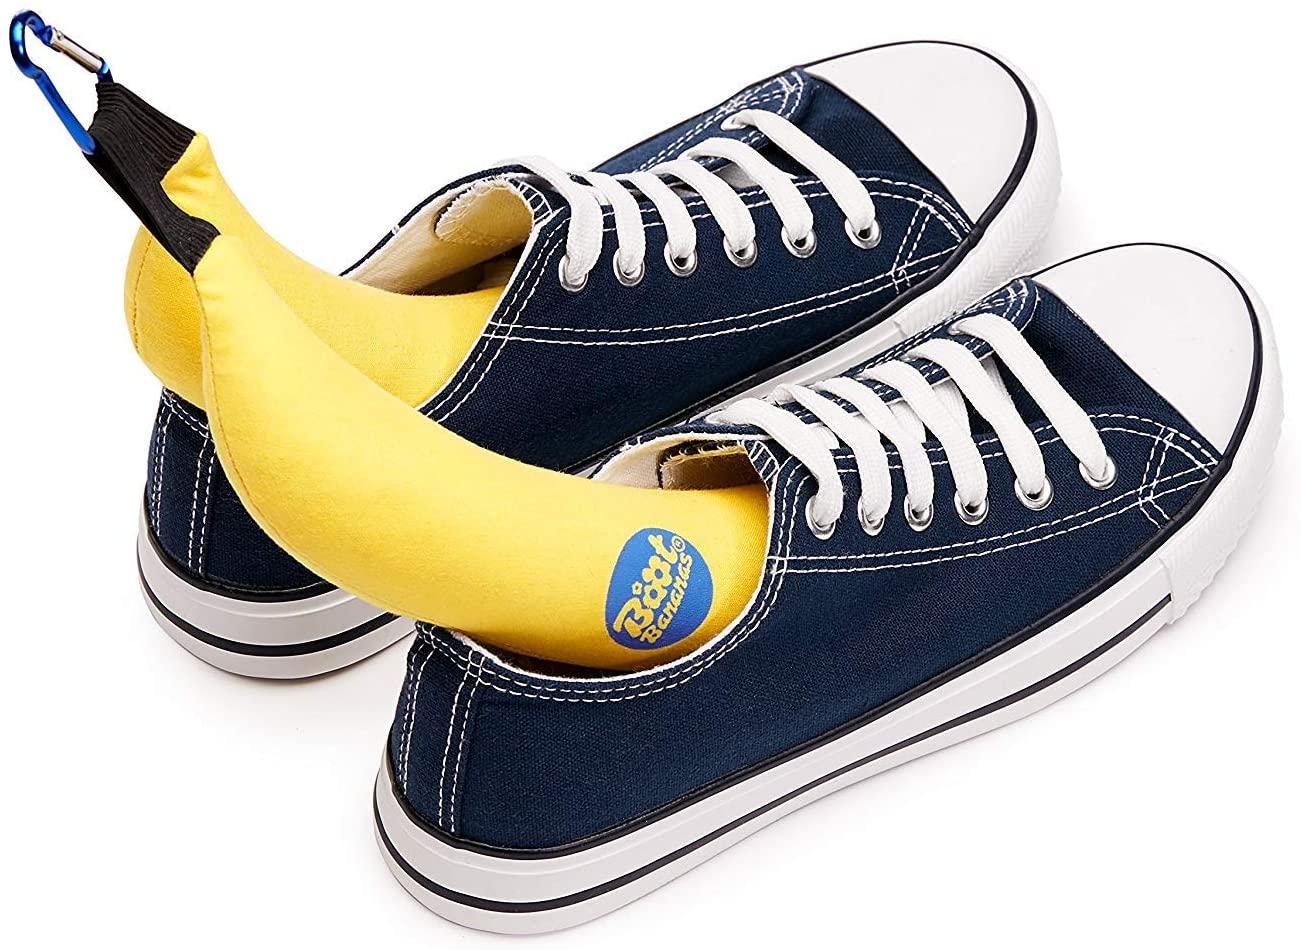 Banana shoe deodorizers